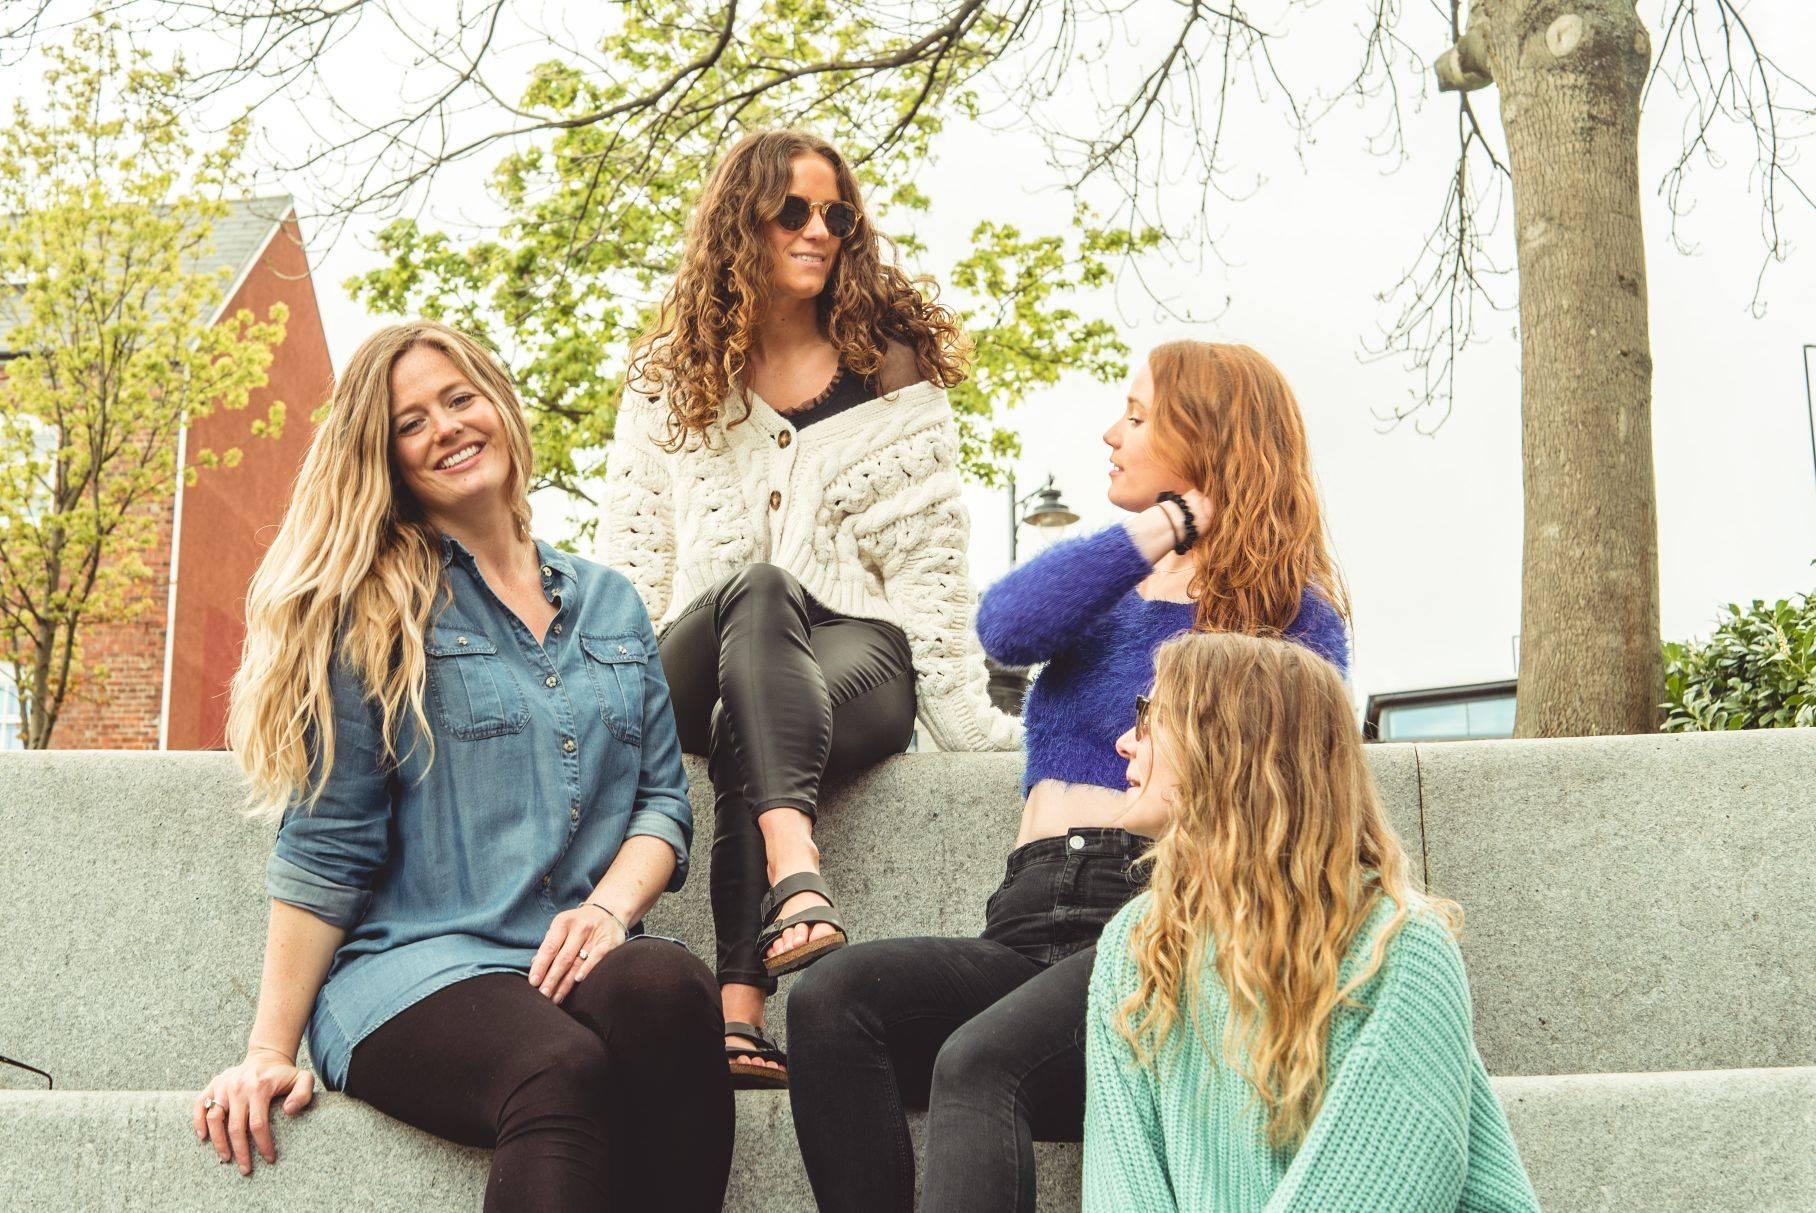 Image of girls sitting on steps